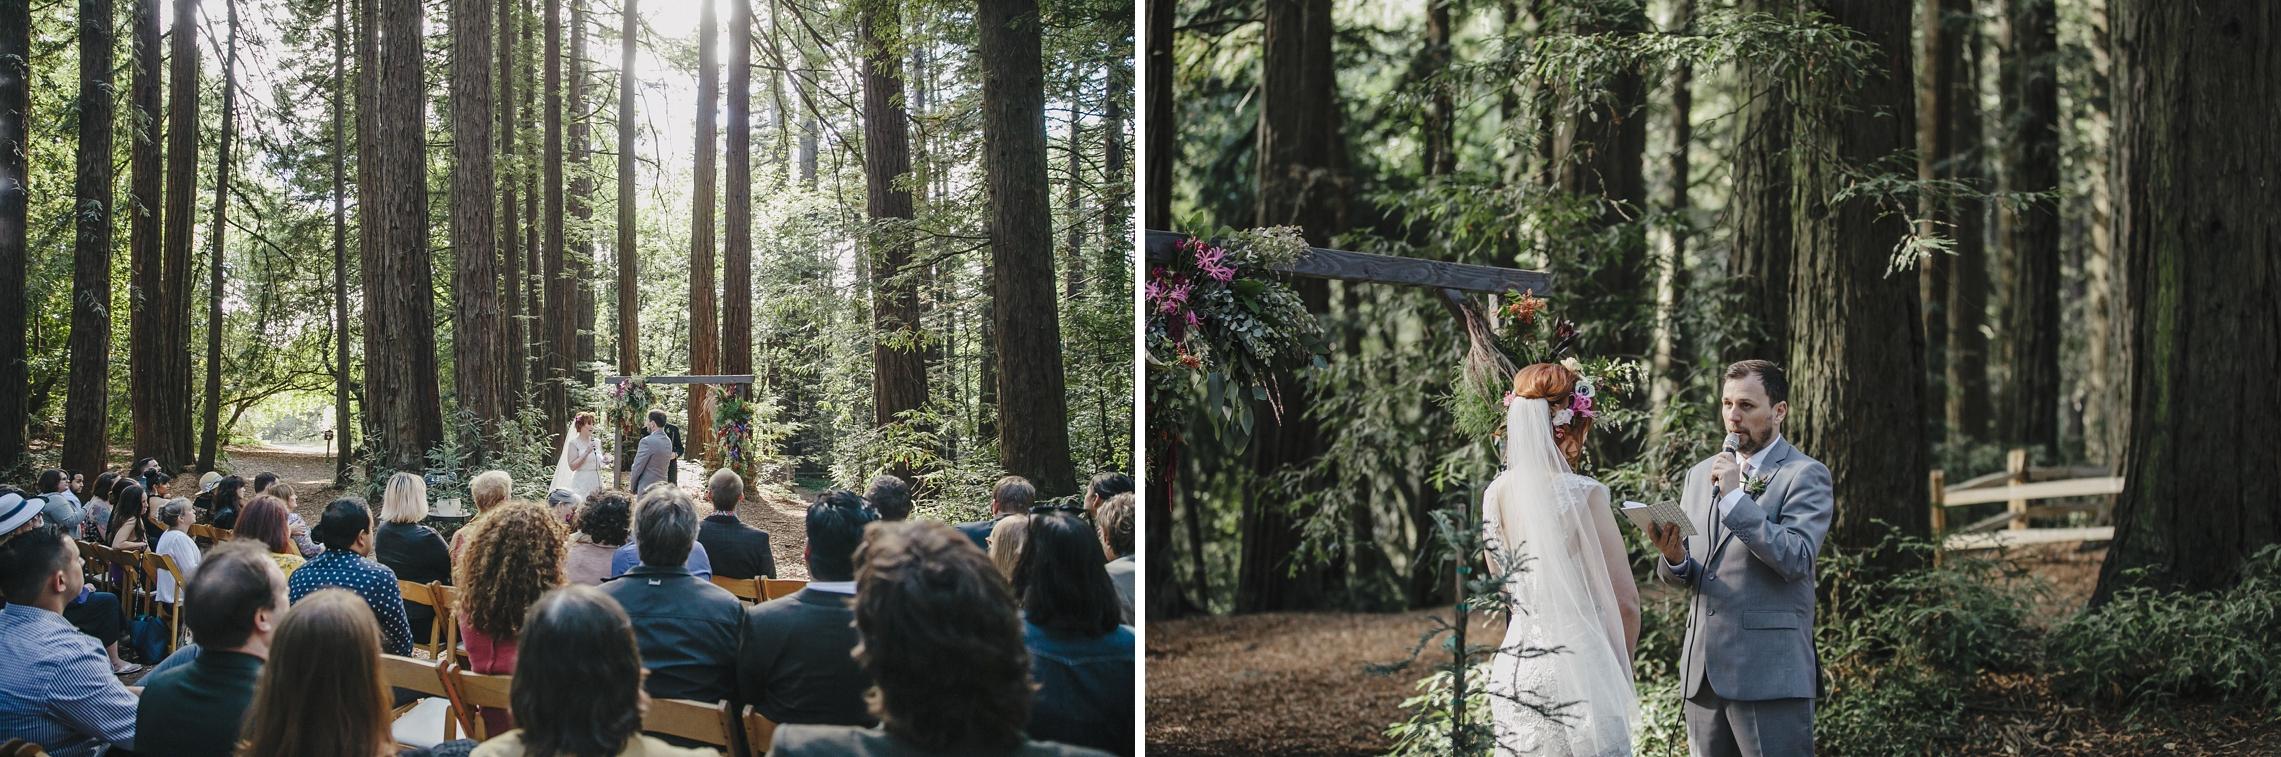 Redwood regional-oakland-wedding_0007.jpg